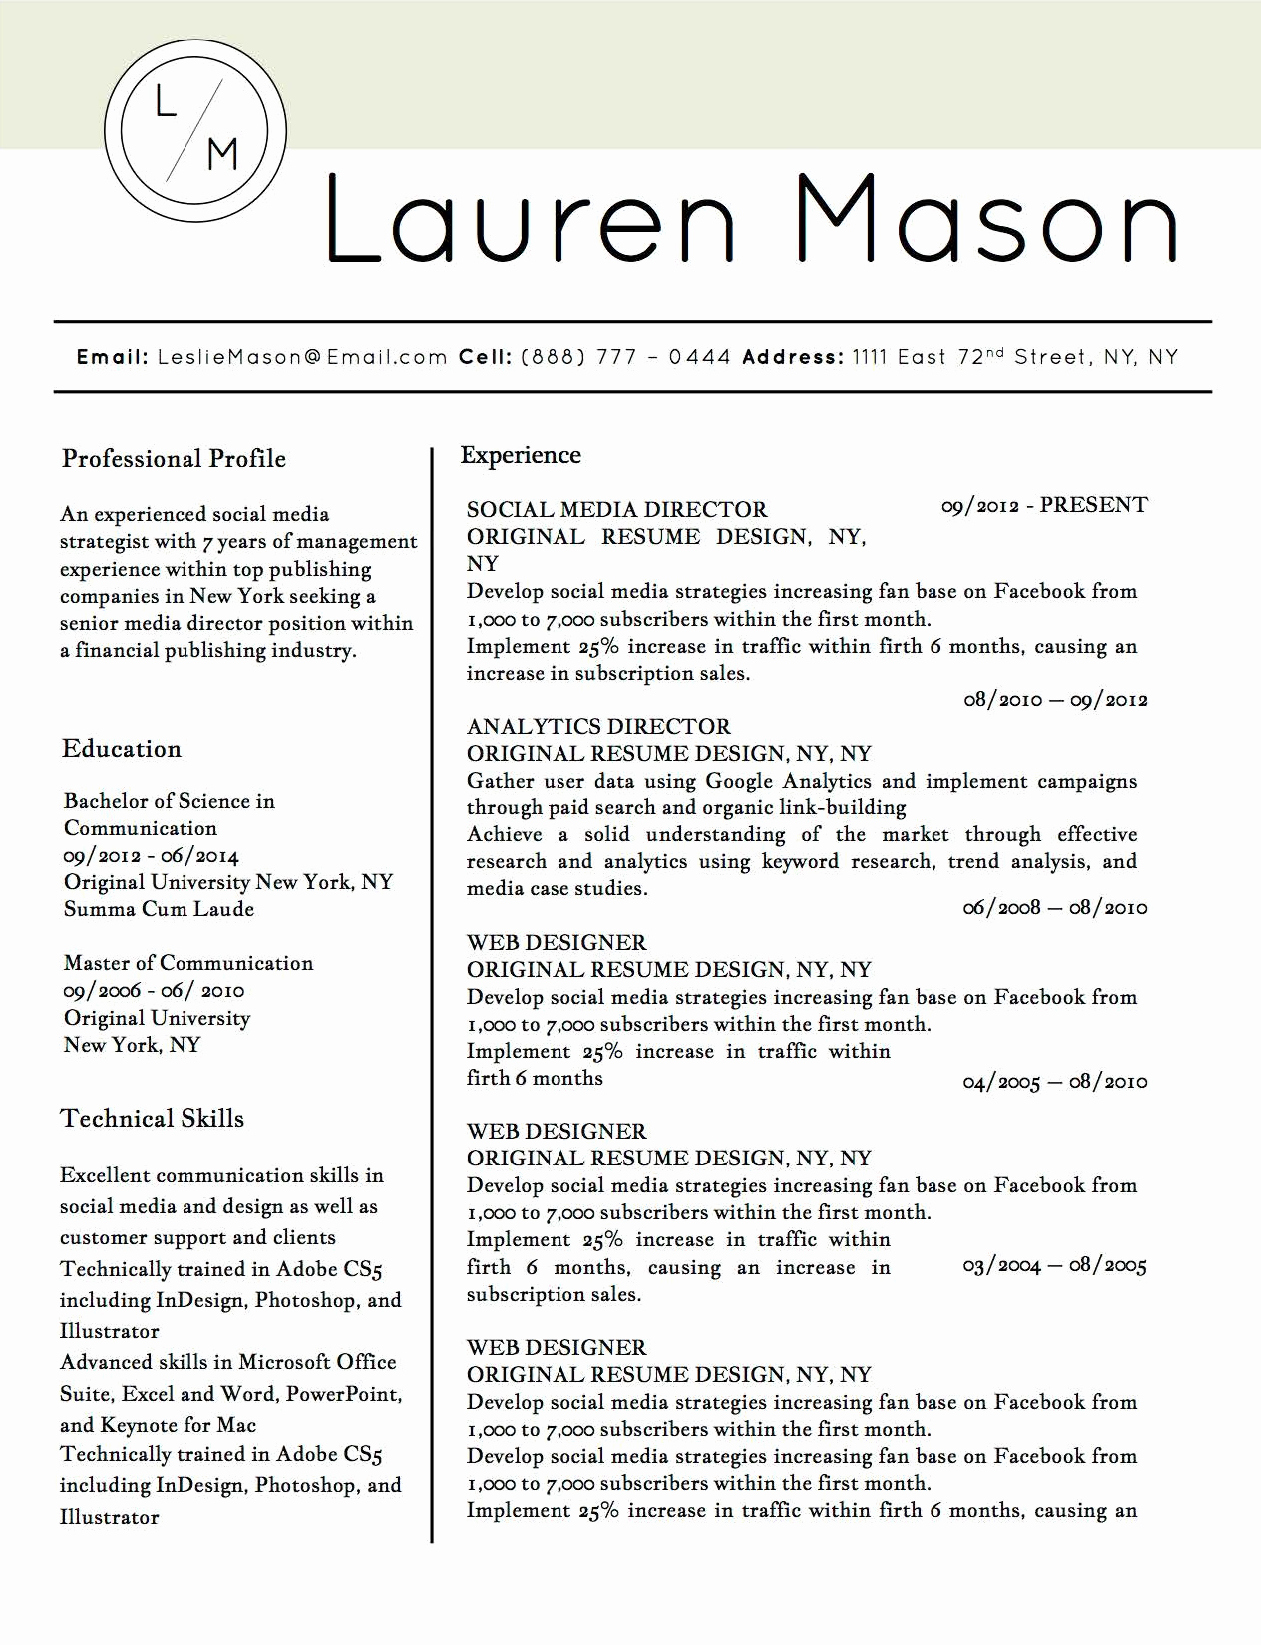 Microsoft Word Resume Templates 2014 Awesome Job Winning Resume Templates for Microsoft Word & Apple Pages